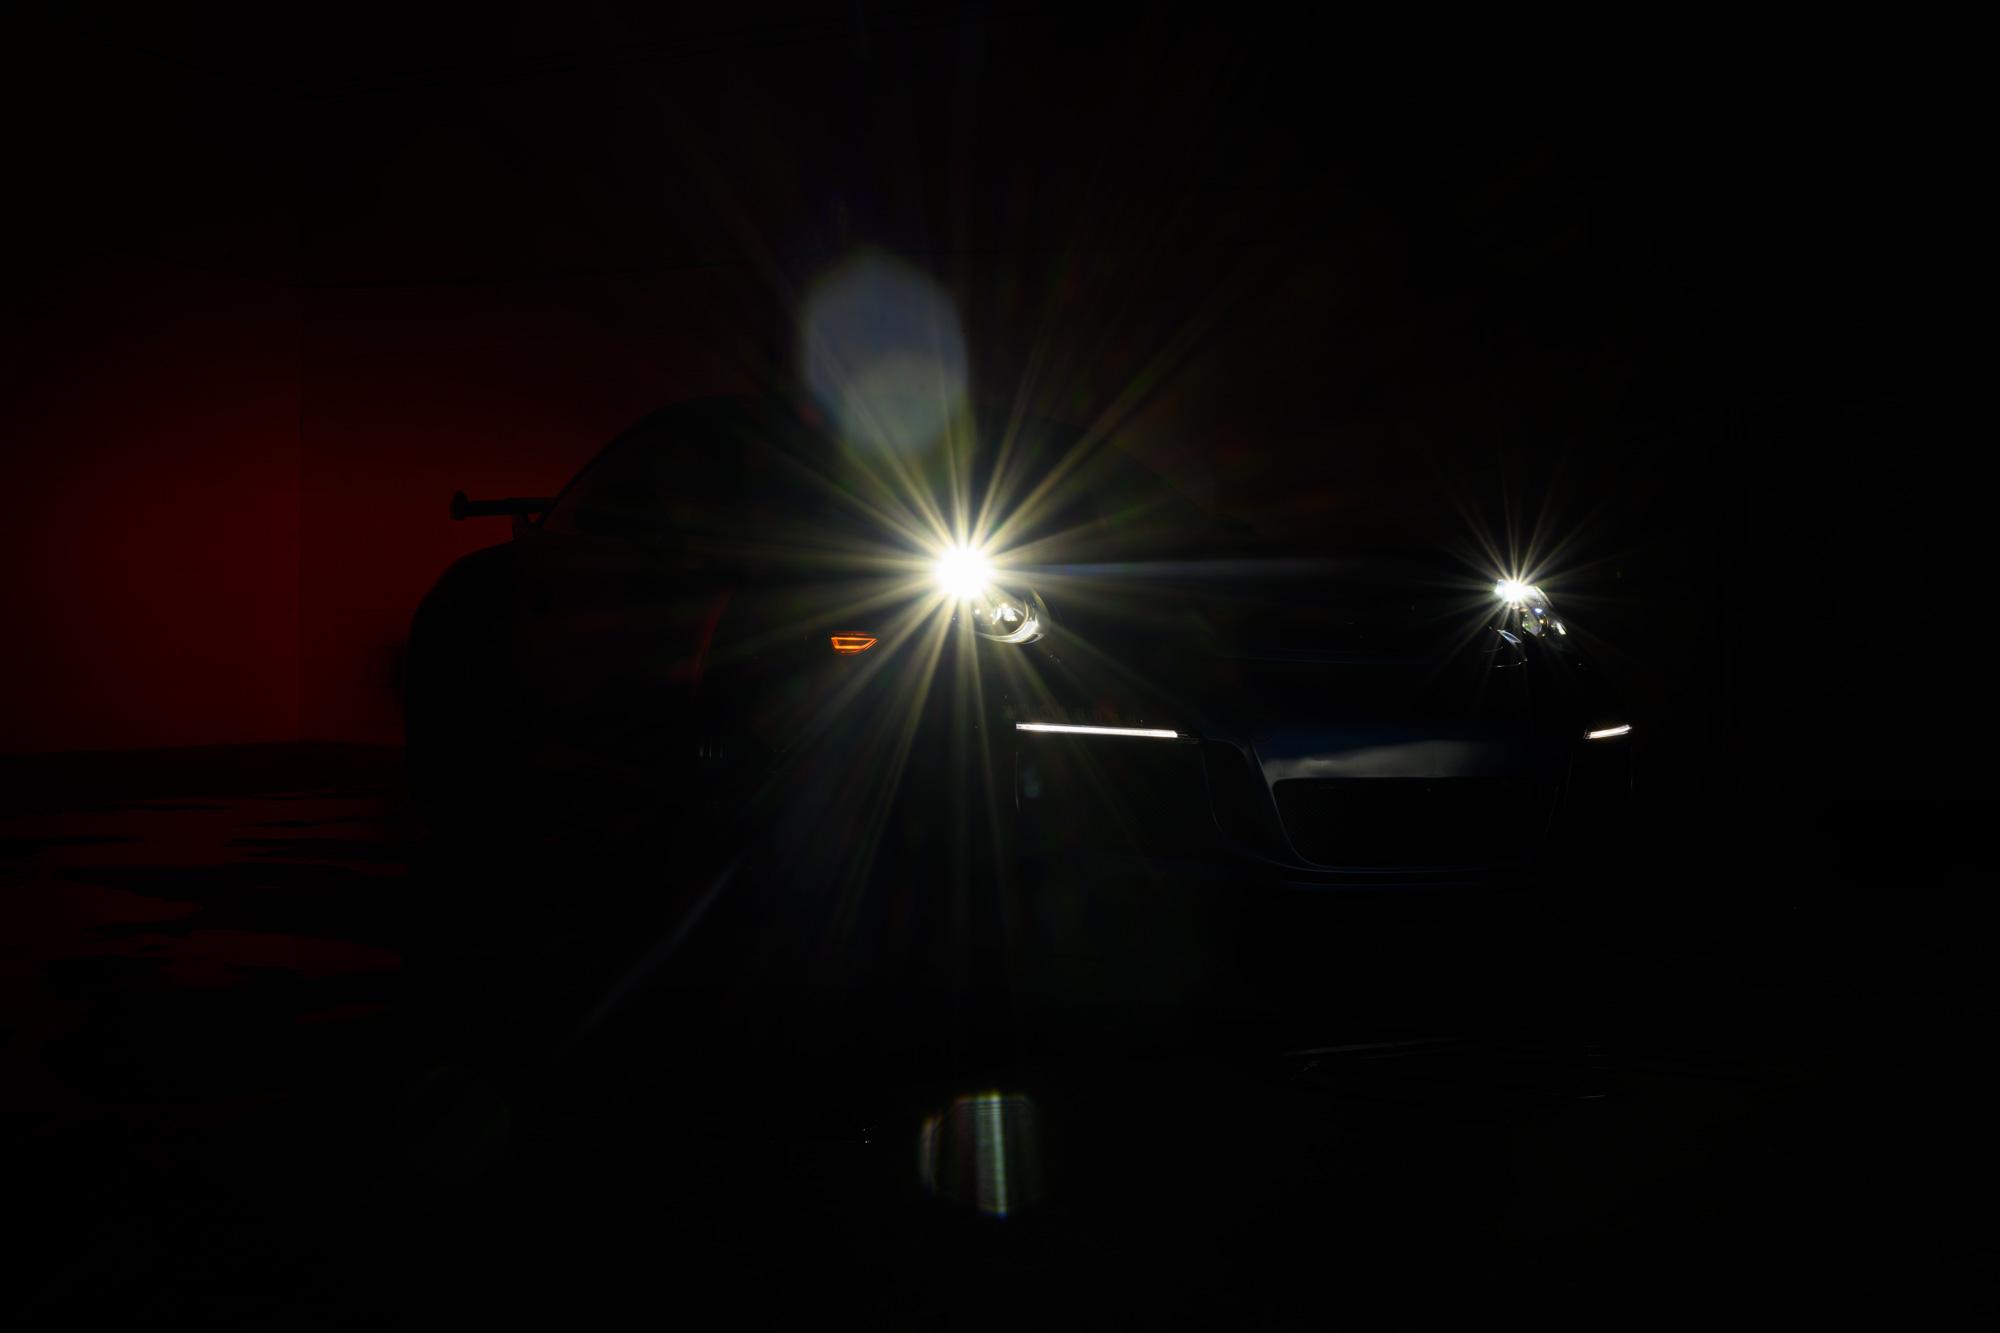 911 GT3 headlights